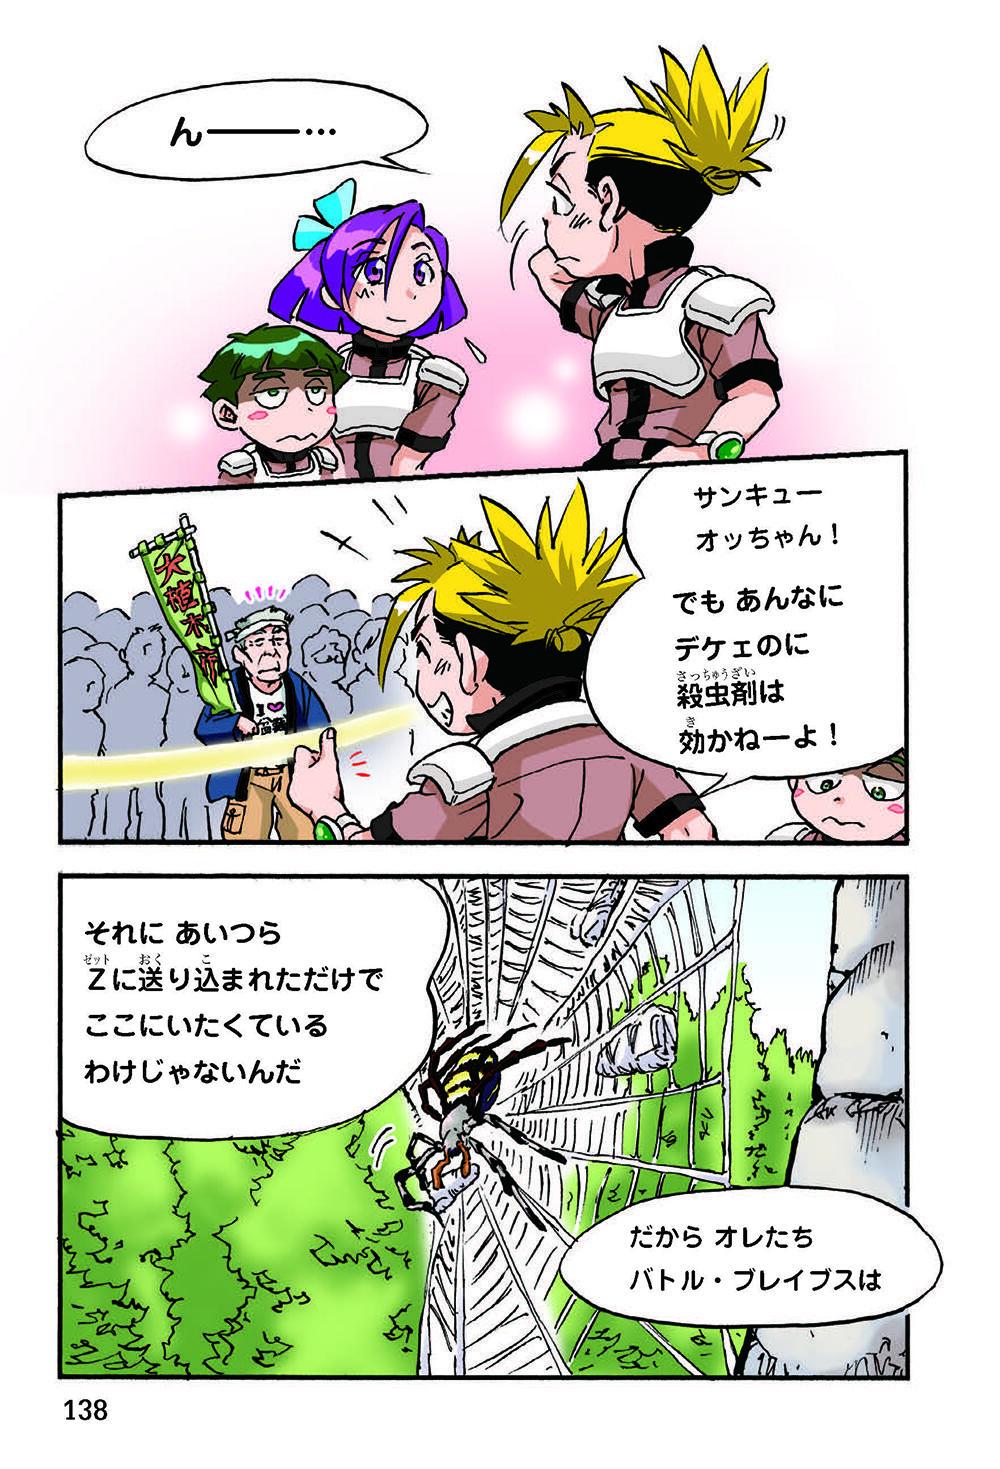 BB_蜊ア髯コ逕溽黄_繝倥z繝シ繧キ繧兩138.jpg